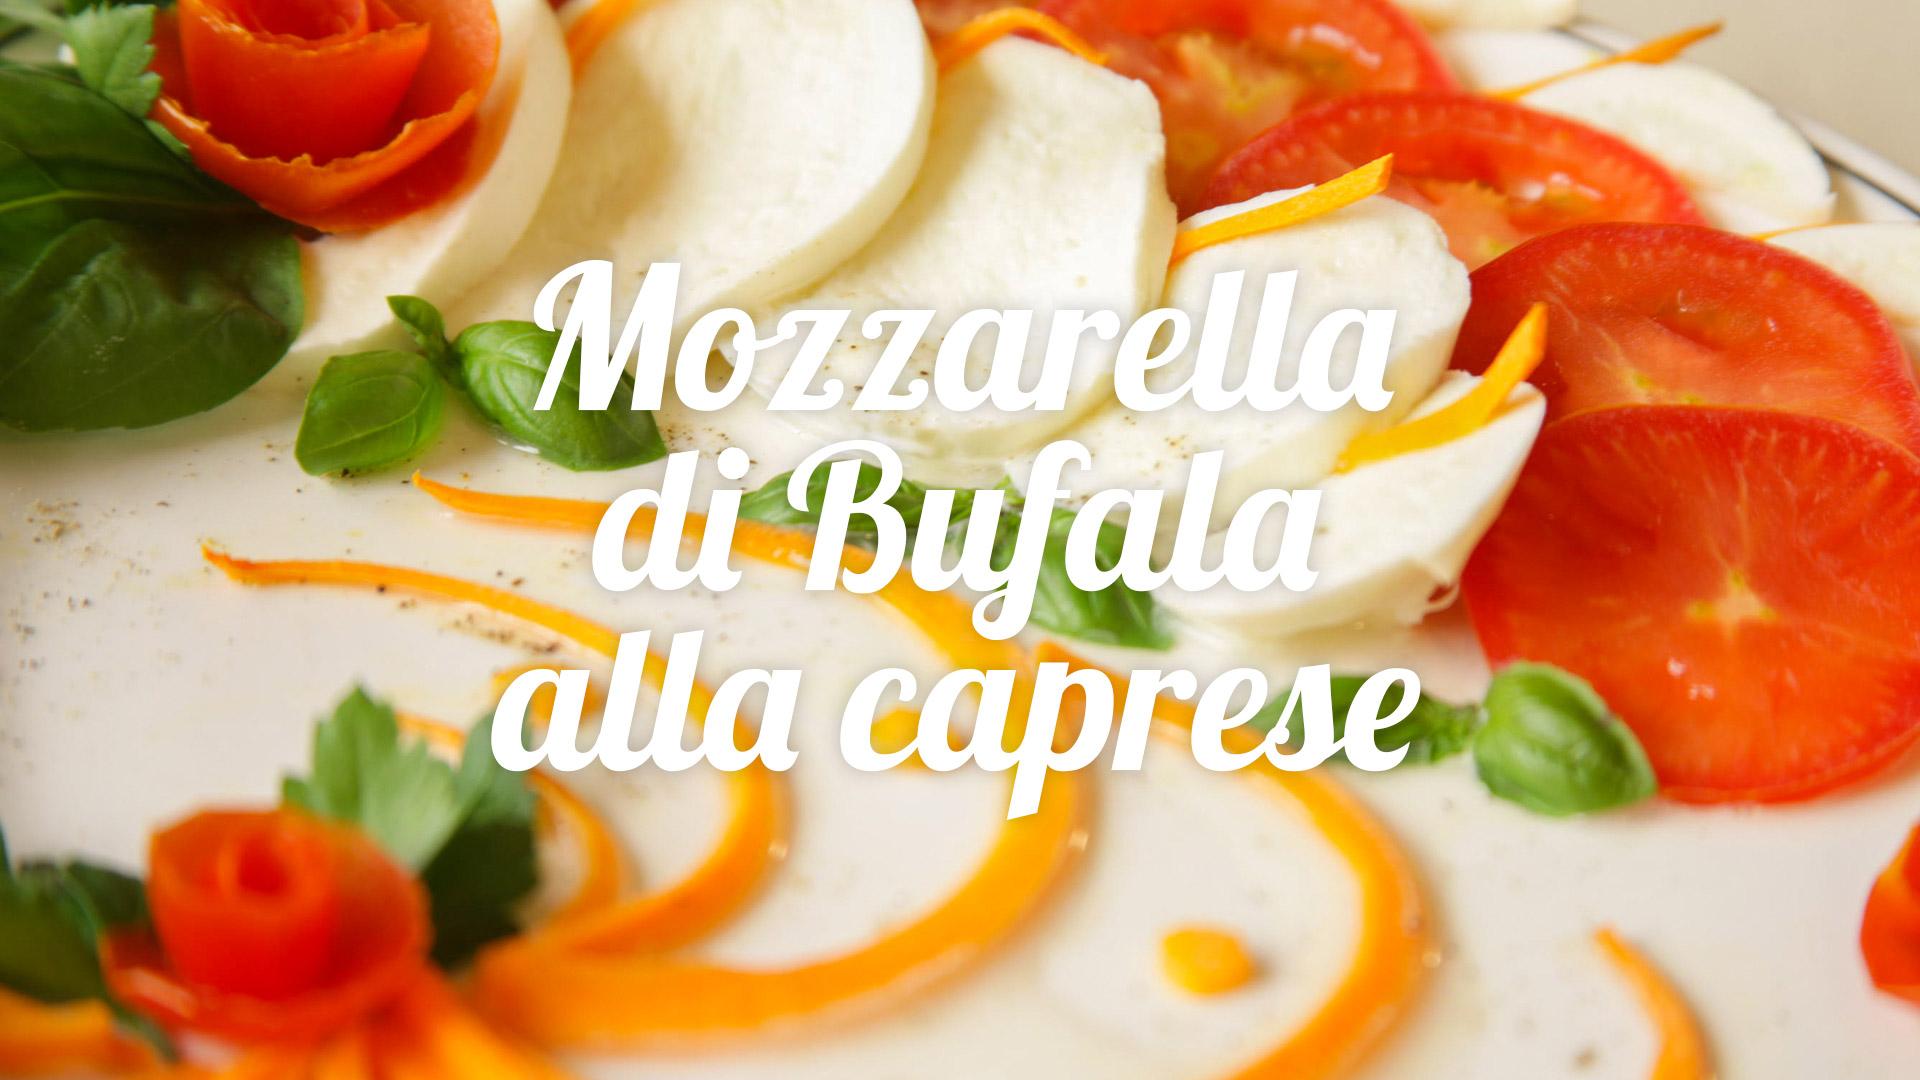 mozzarella-bufala-caprese